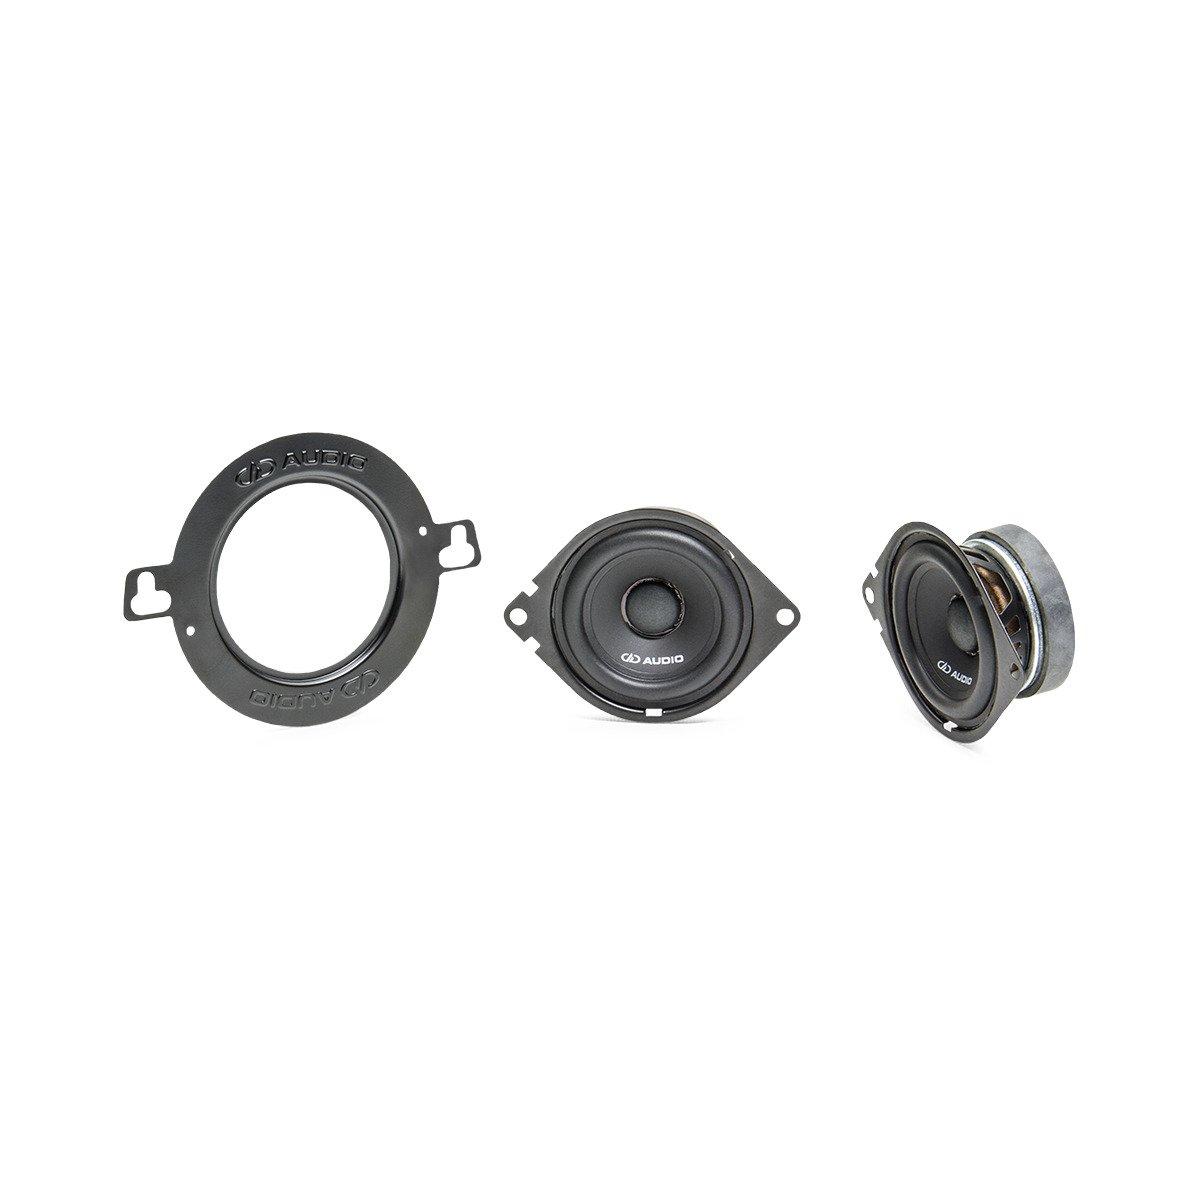 "DD Audio EX2.75 2.75"" 75w (25W RMS) 1 way Coaxial Car Speaker (pair)"